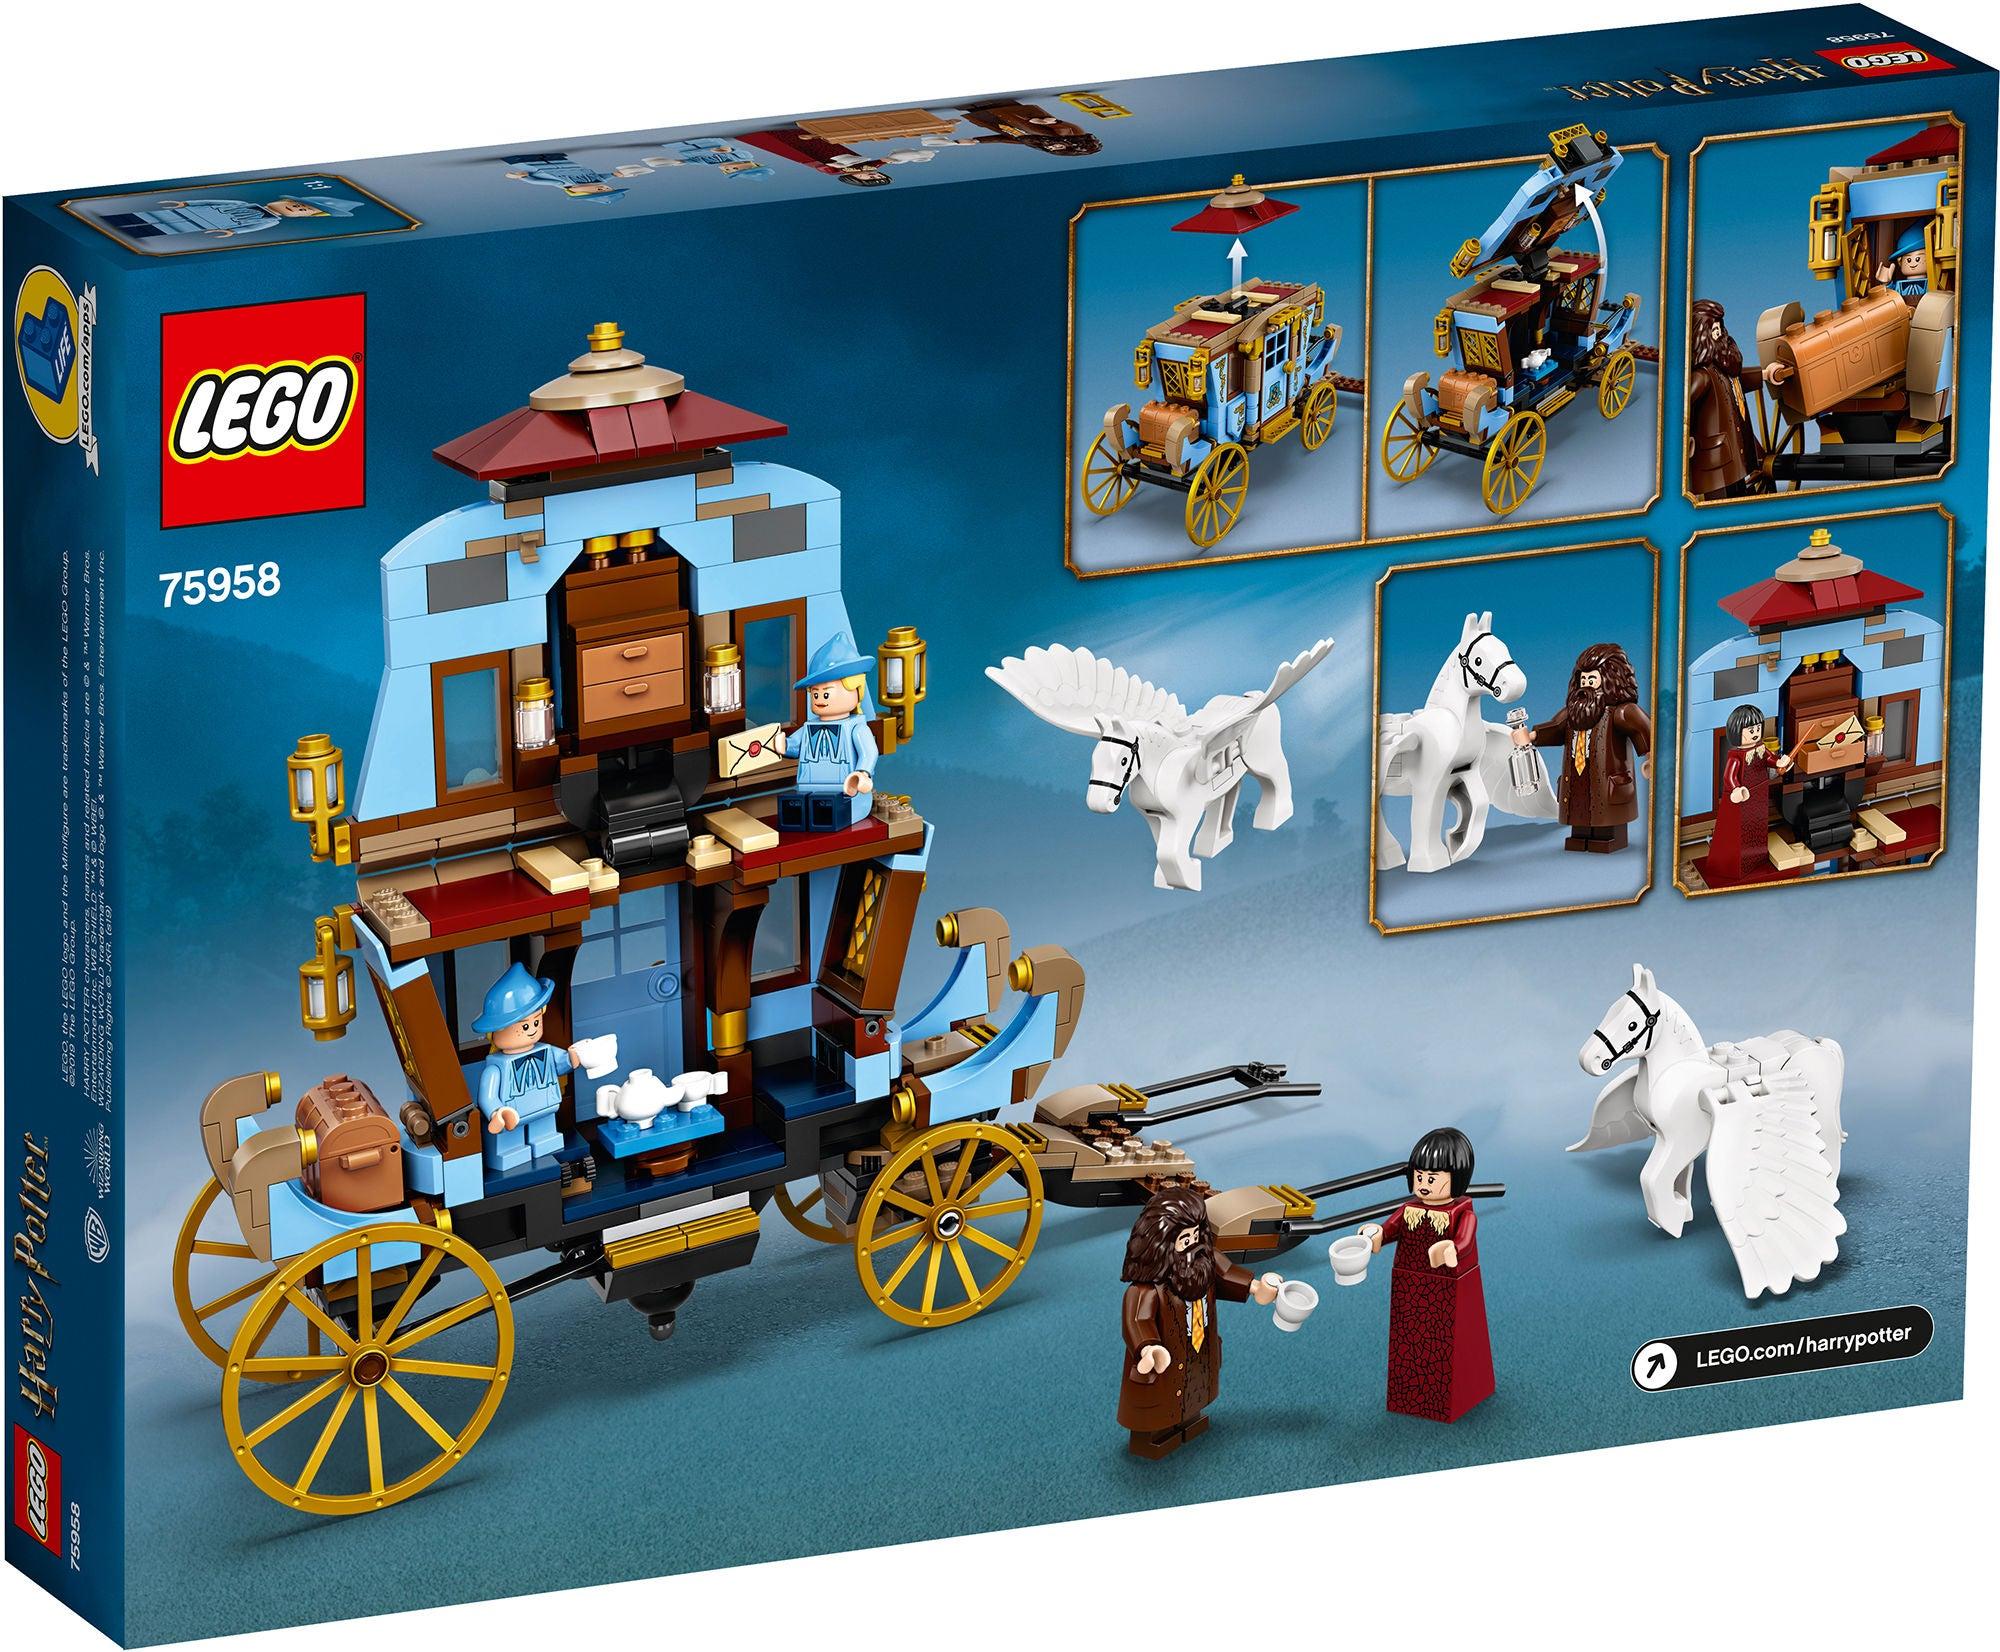 LEGO Harry Potter_75958_Beauxbatons Vagn Ankomsten_till_Hogwarts